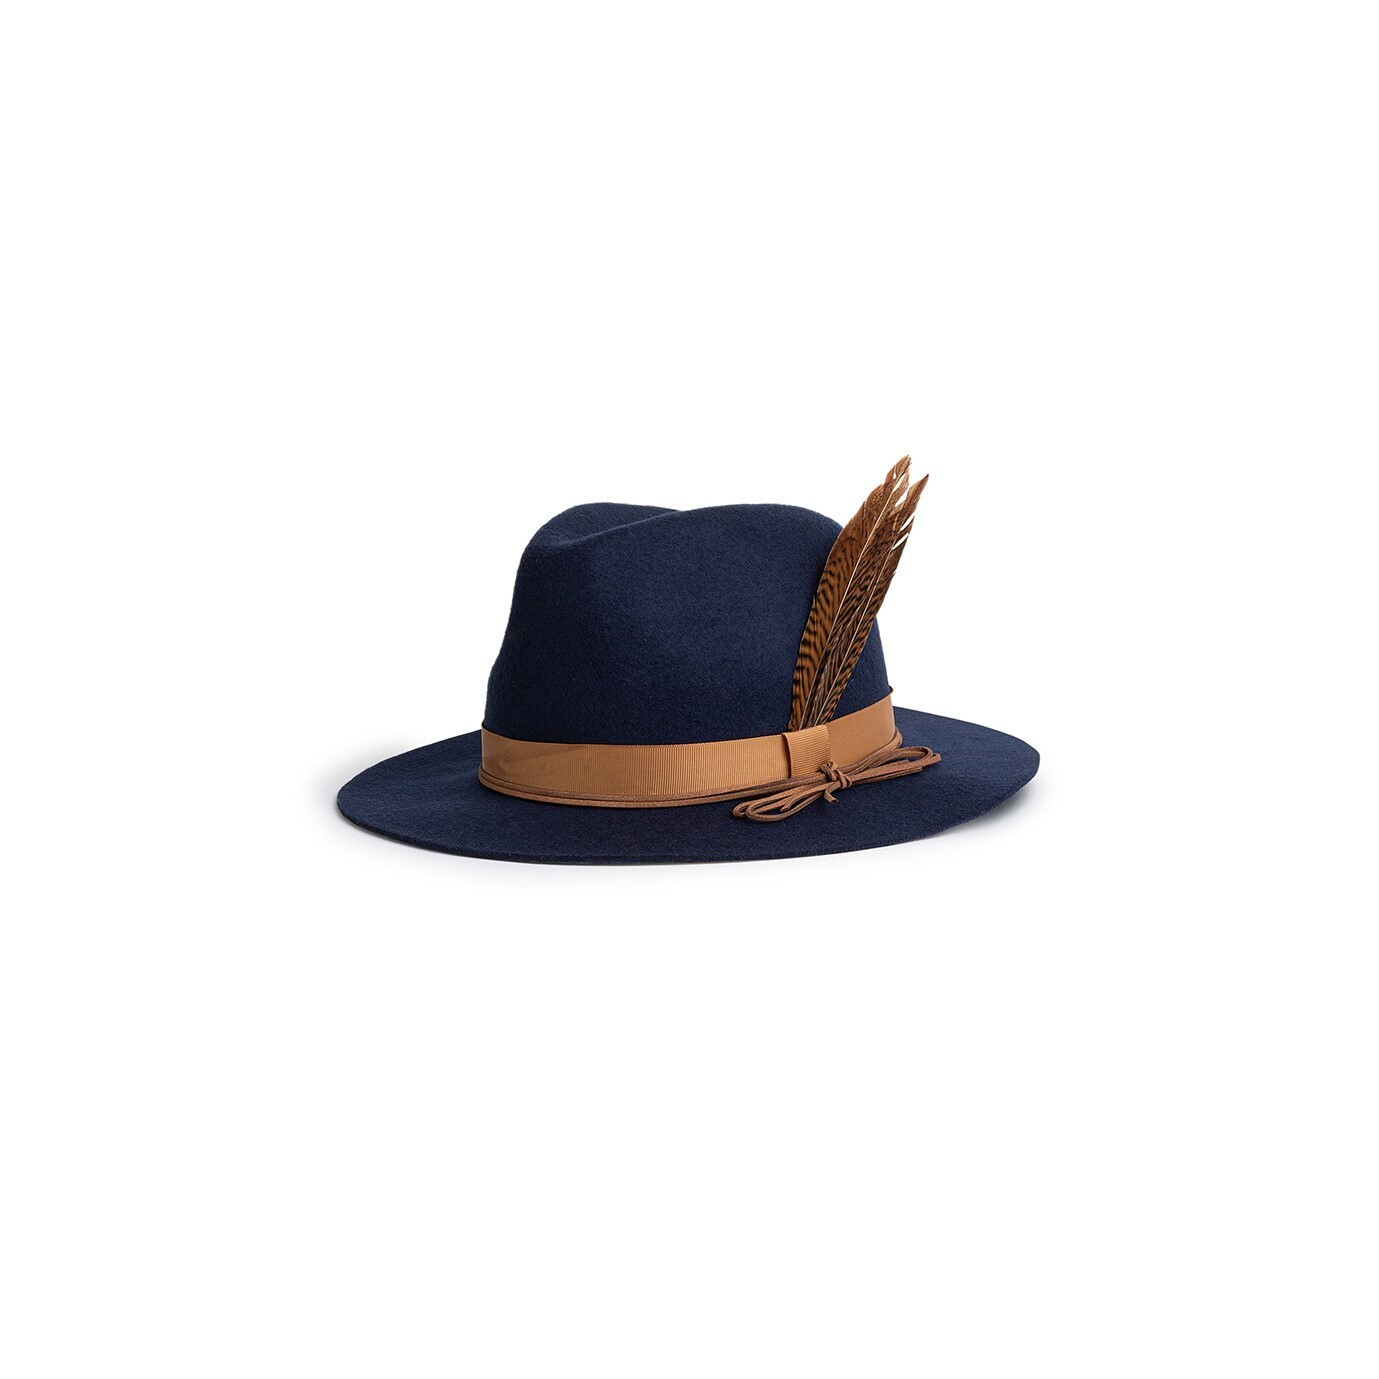 Chapeau Pheasant Bleu Marine